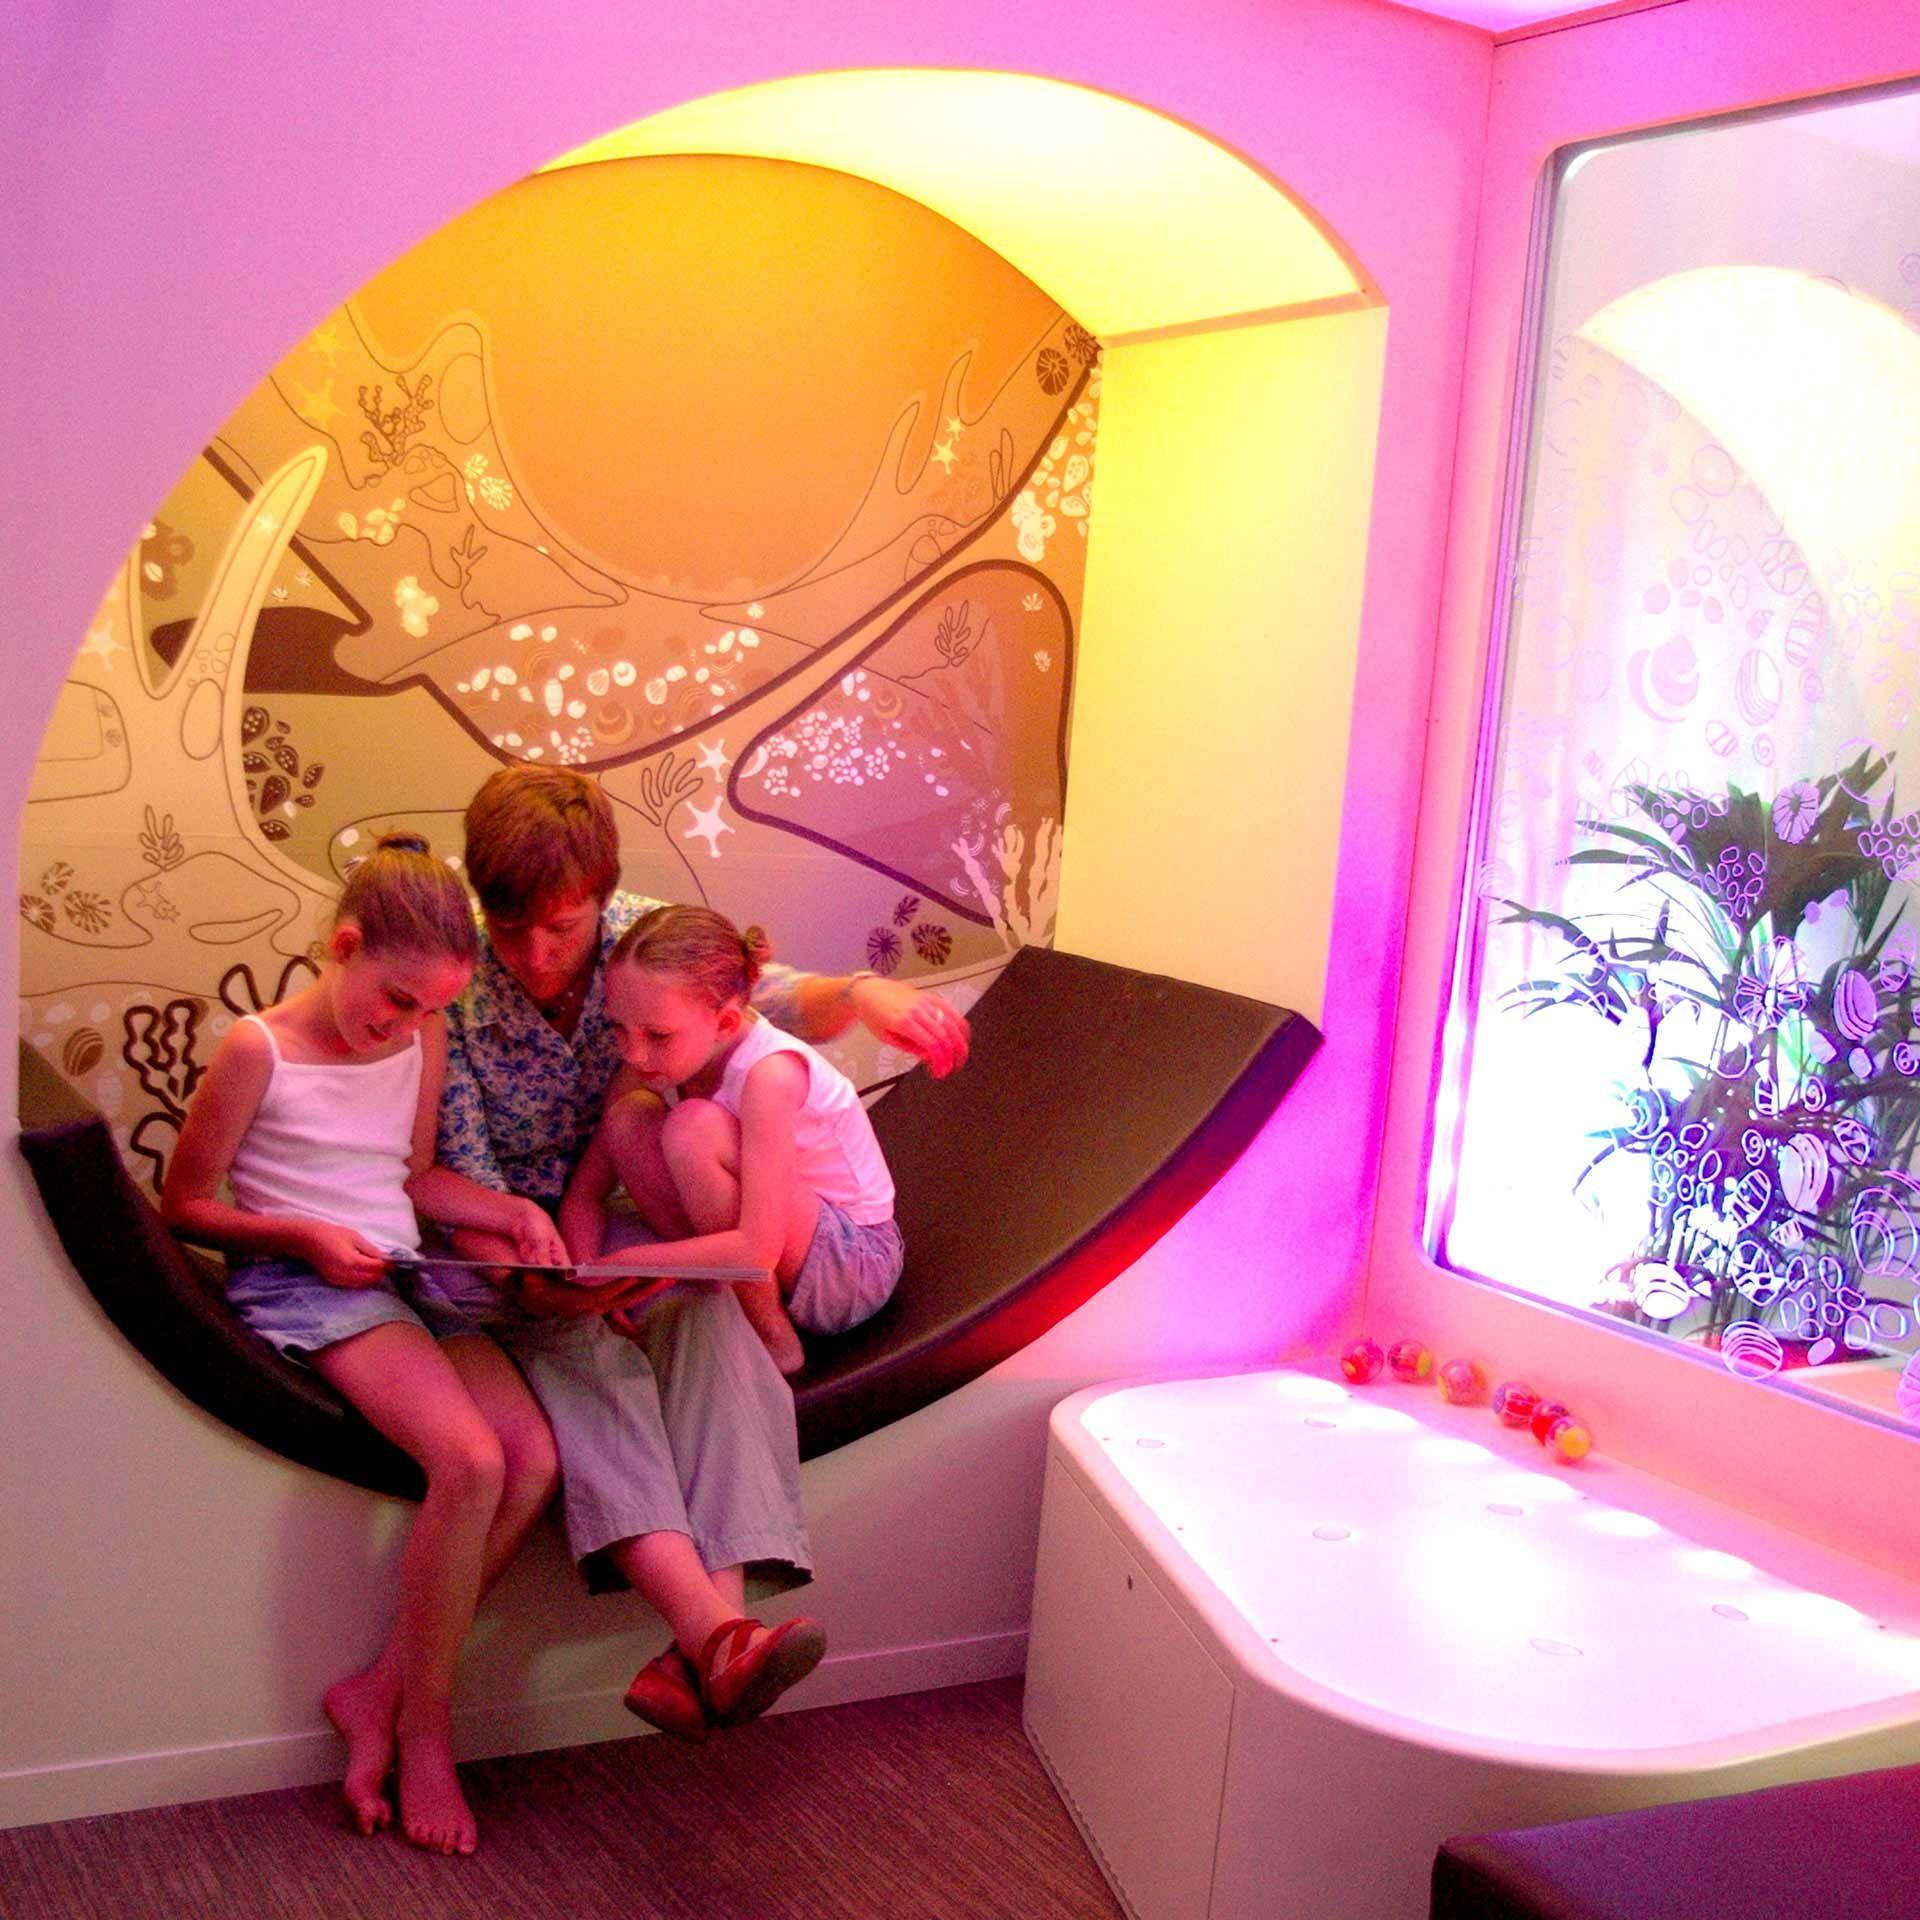 Colourful Nhs Family Room Family Room Hospital Design Healthcare Design